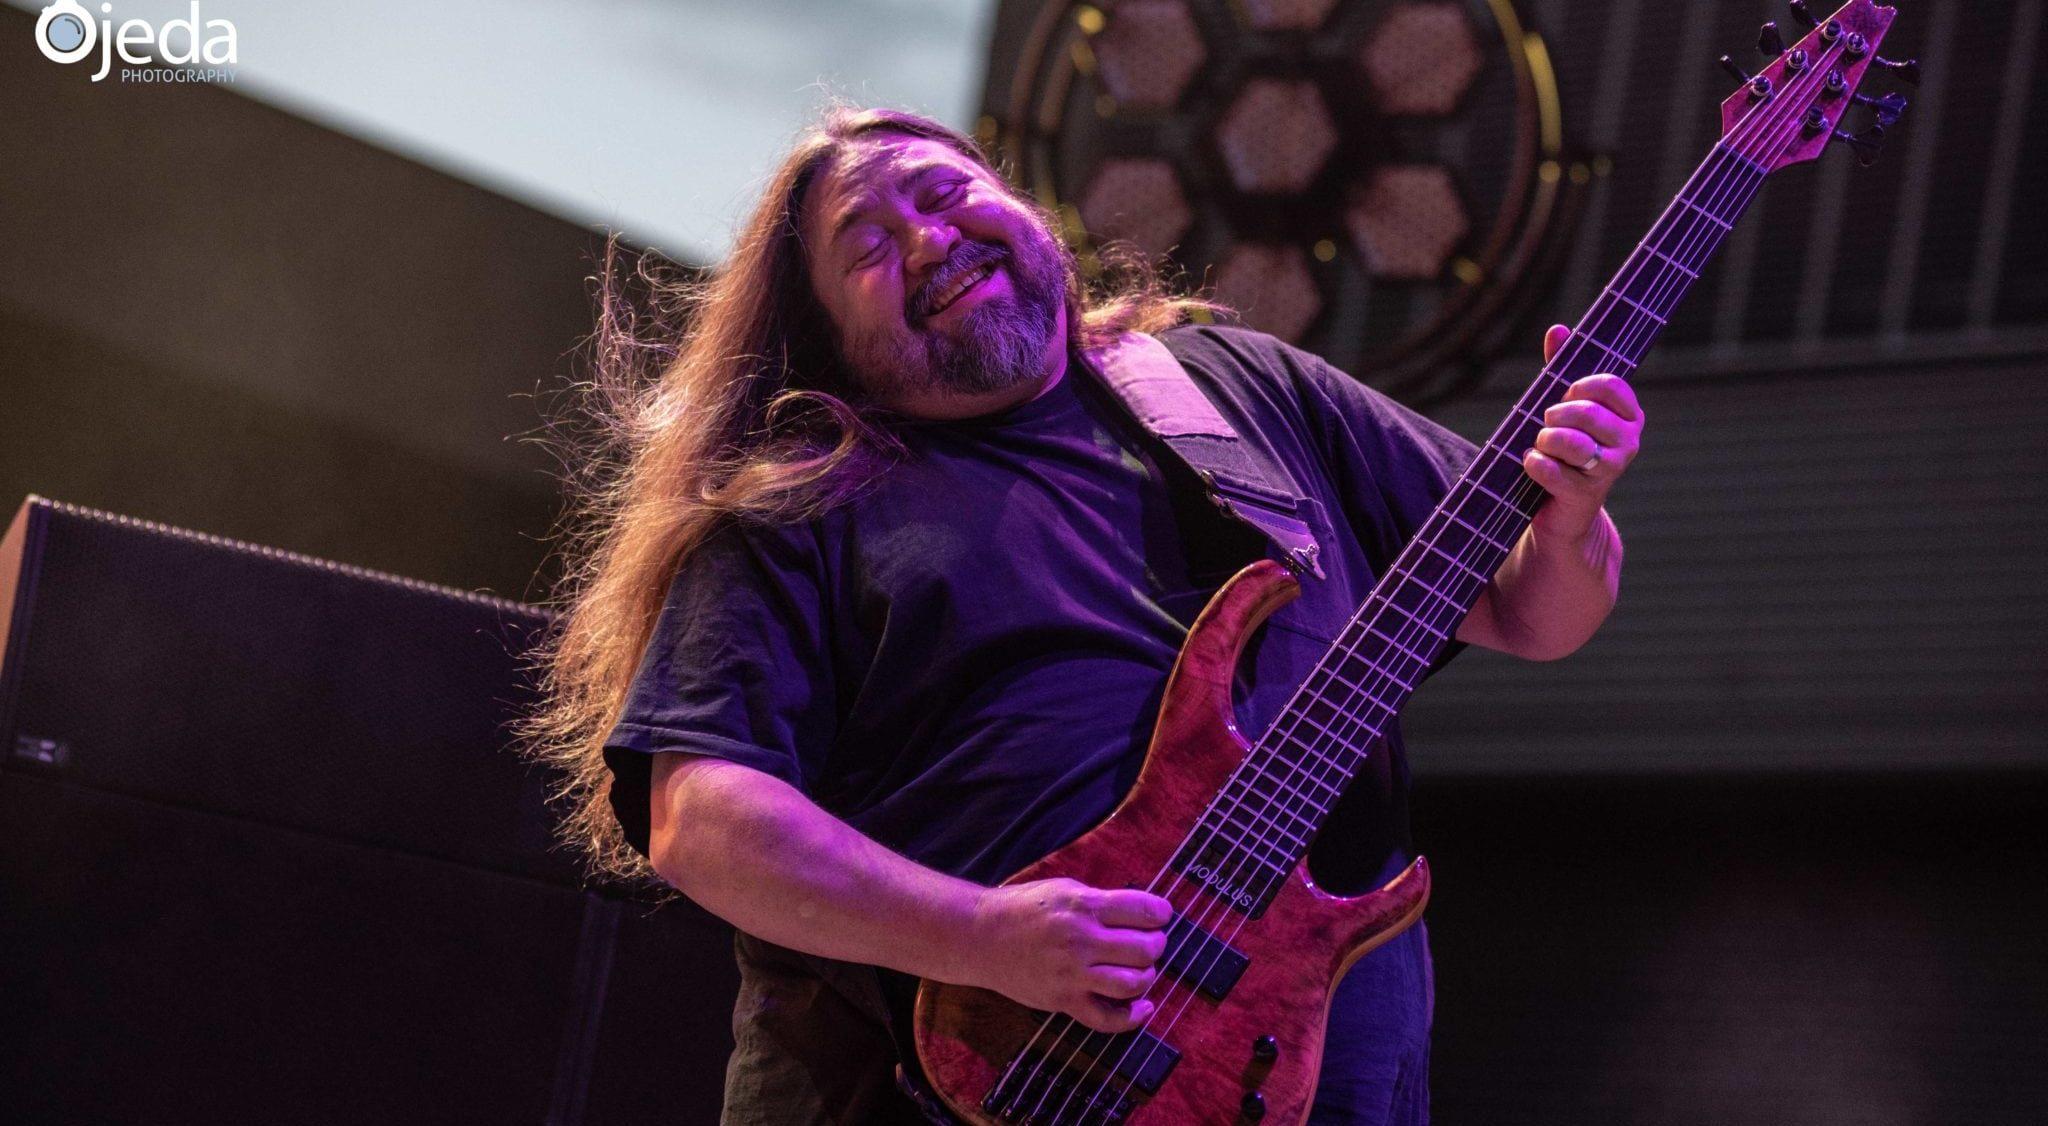 Widespread Panic Bassist Dave Schools Curates Playlist Of 'Bass Godz